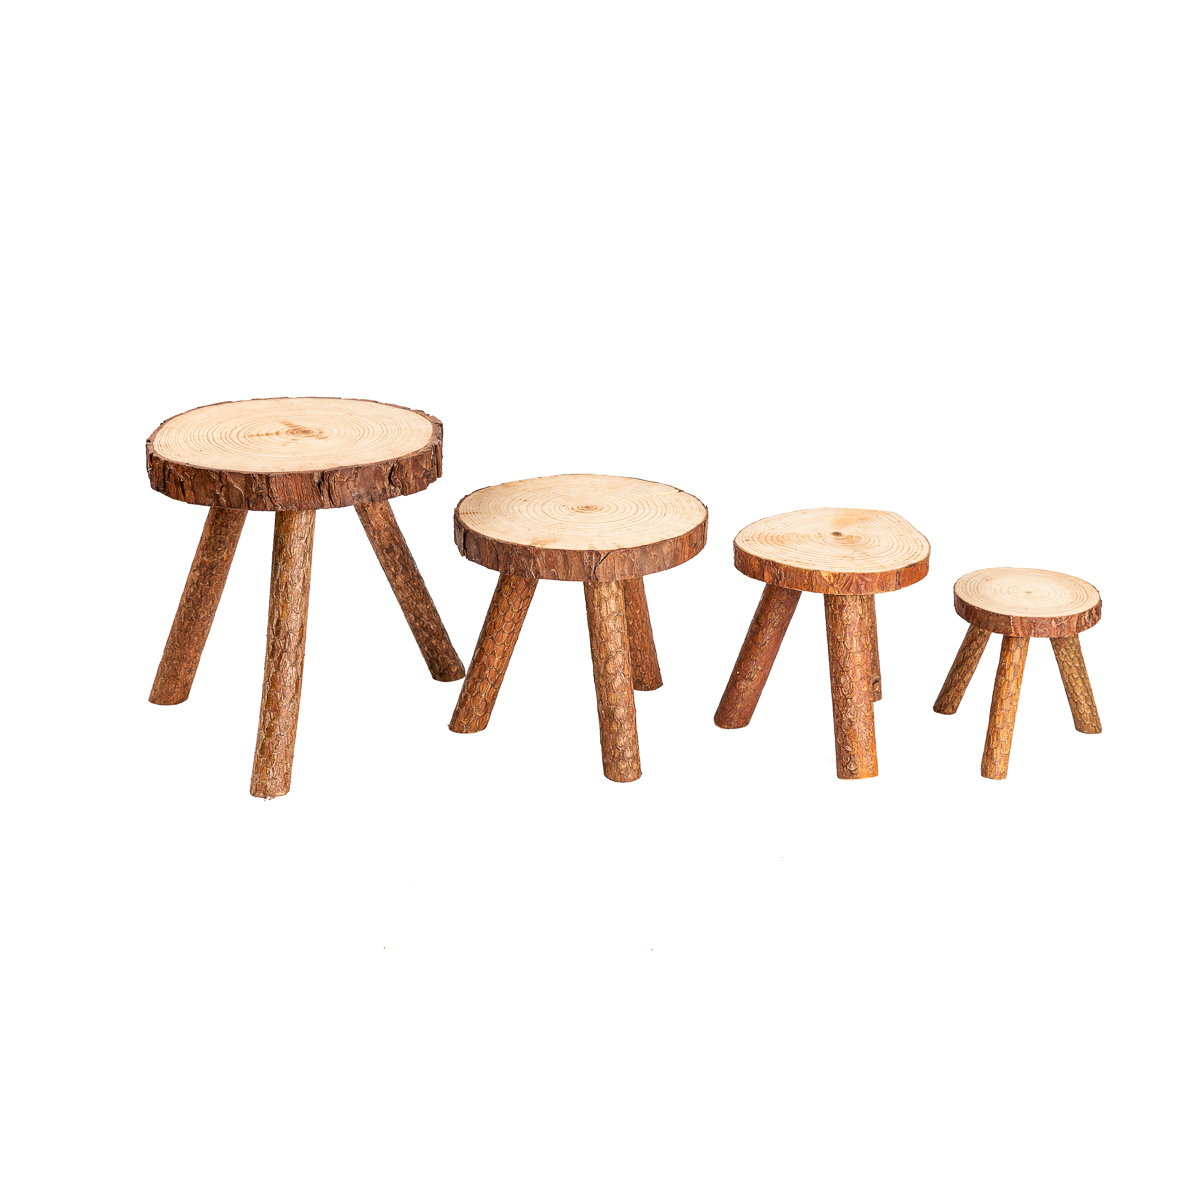 Enjoyable Rustic Tree Trunk Slices Wood Three Legged Plant Stand Vase Beatyapartments Chair Design Images Beatyapartmentscom